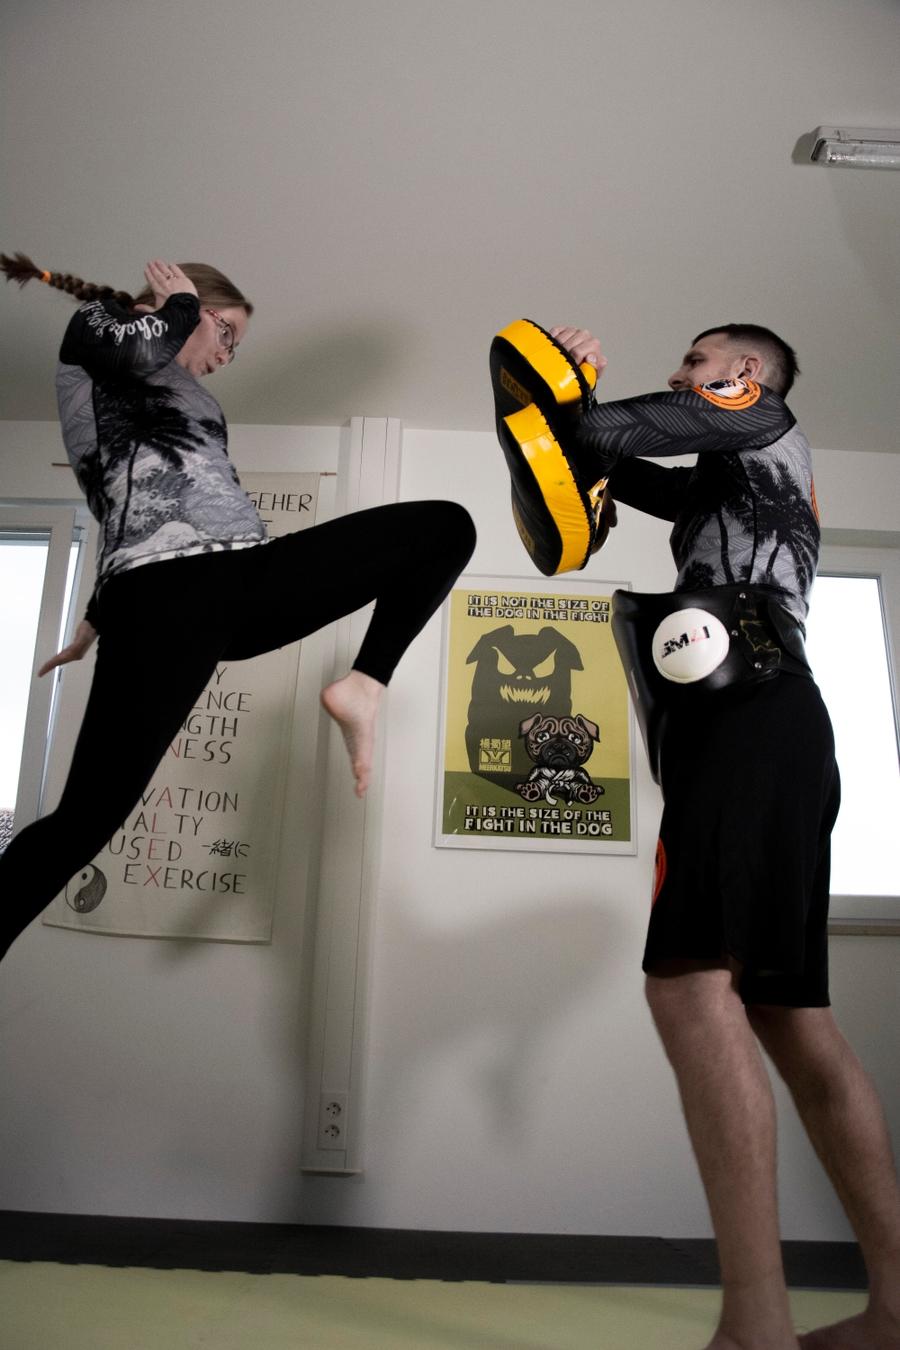 Shoot-Boxing